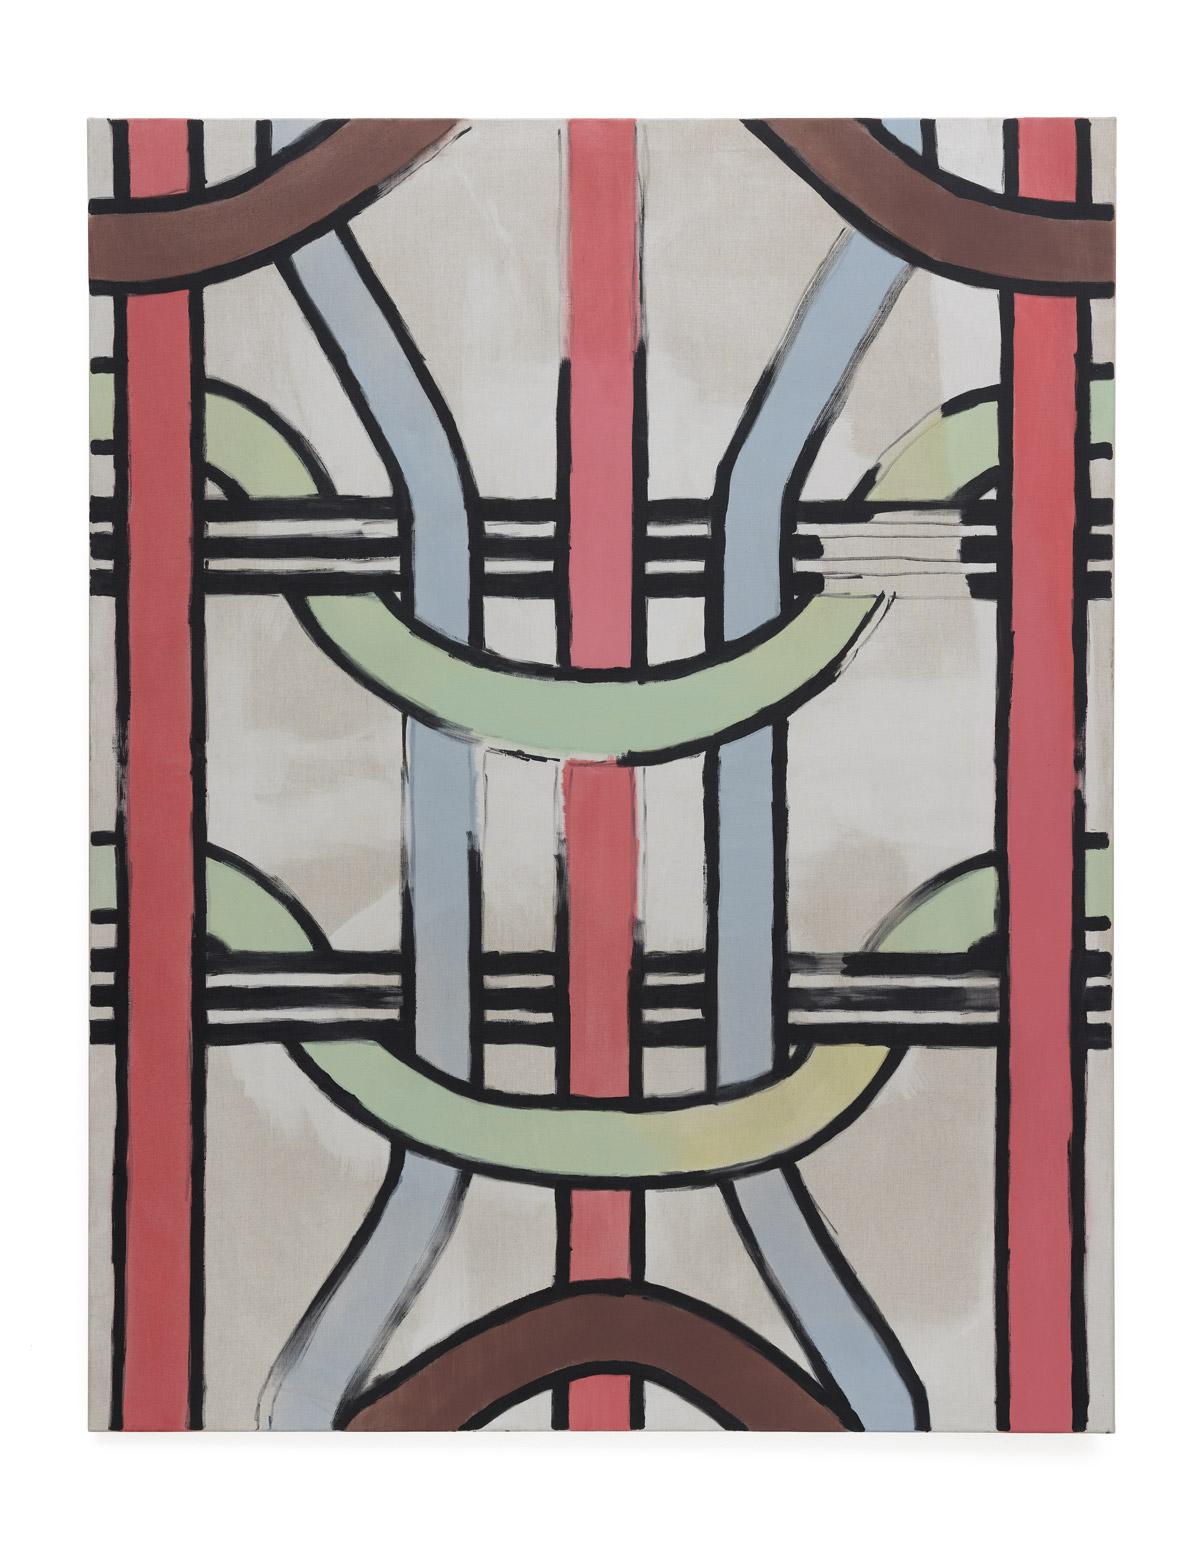 Martin Feldbauer Underdog II 2018 acrylic on linen 185x145 cm